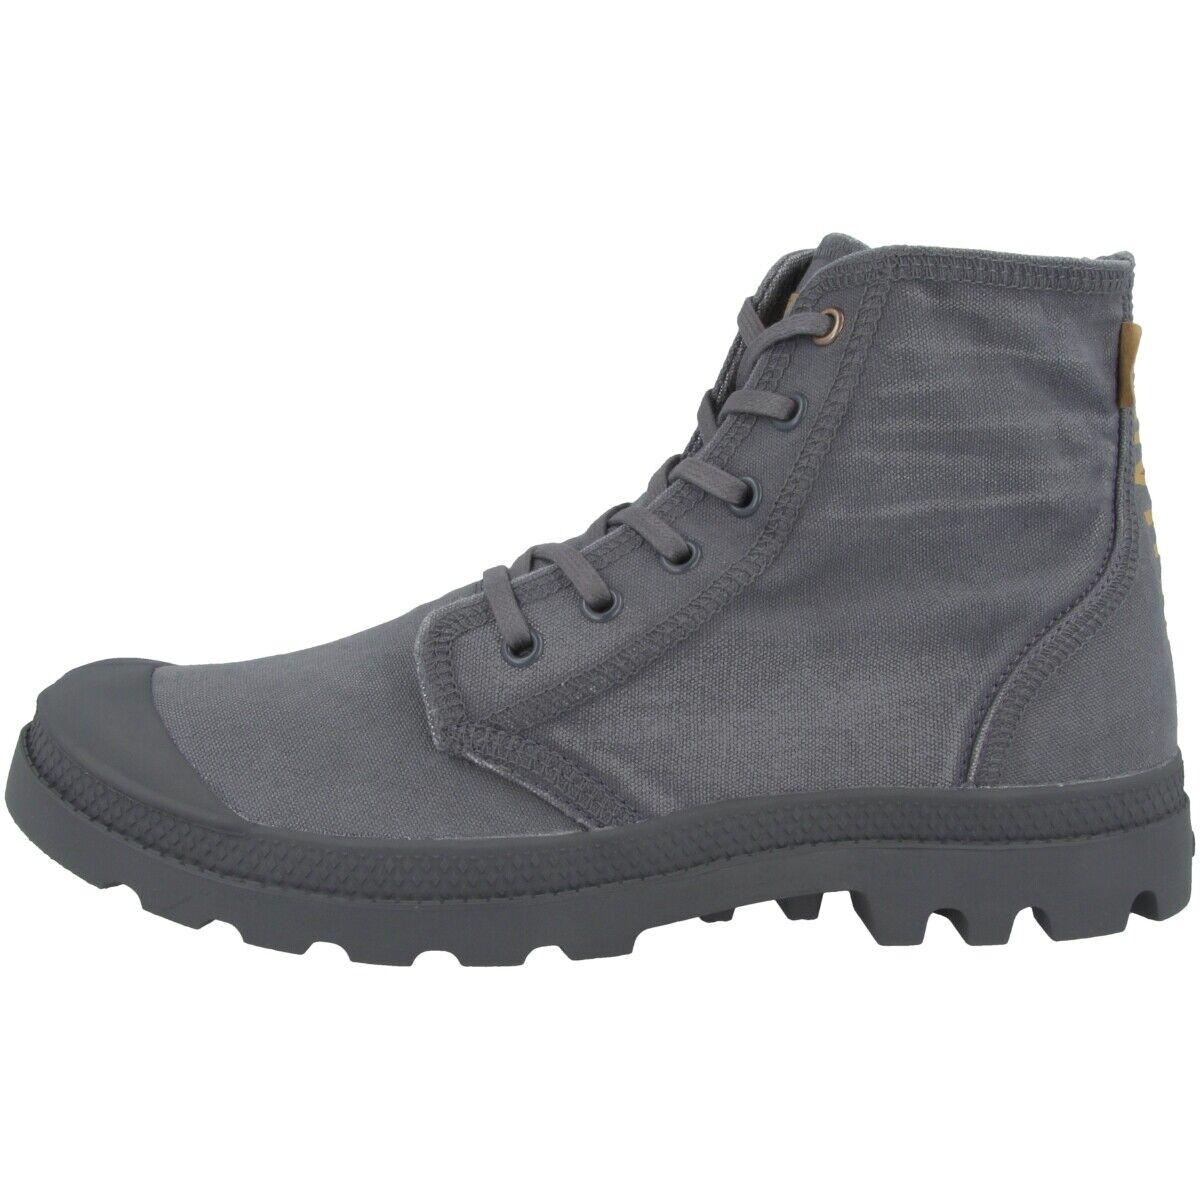 Palladium palladenim botas zapatos High Top ocio cortos forged 76230-014